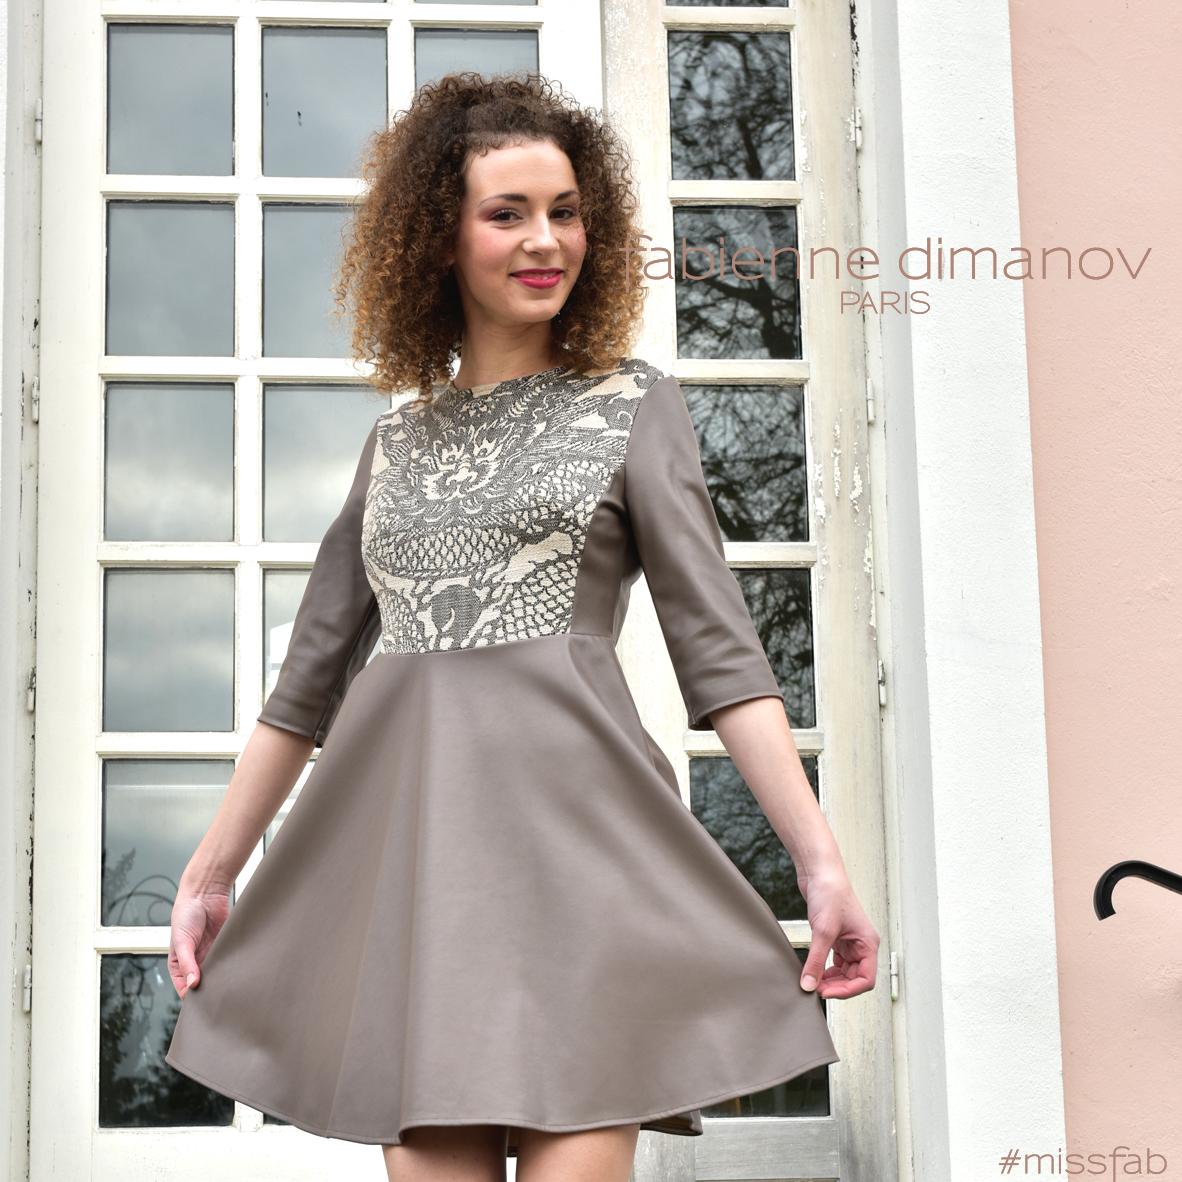 Robe perso #missfab - robe patineuse - Fabienne Dimanov Paris